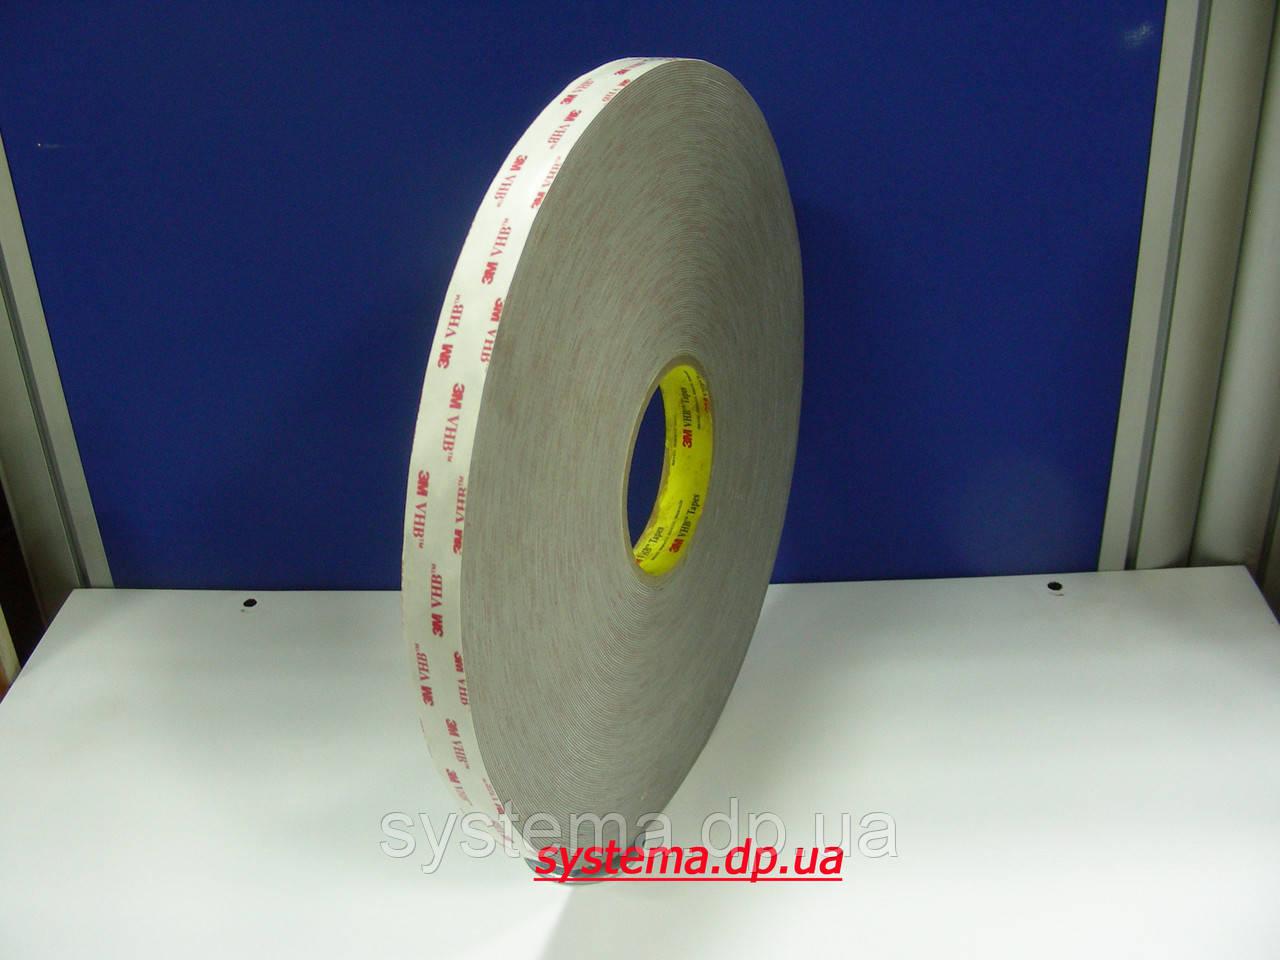 3M™ VHB™  RP32P - Скотч монтажный, двухсторонний 3M, 19,0х0,8 мм, рулон 66 м, бумаж. лайнер